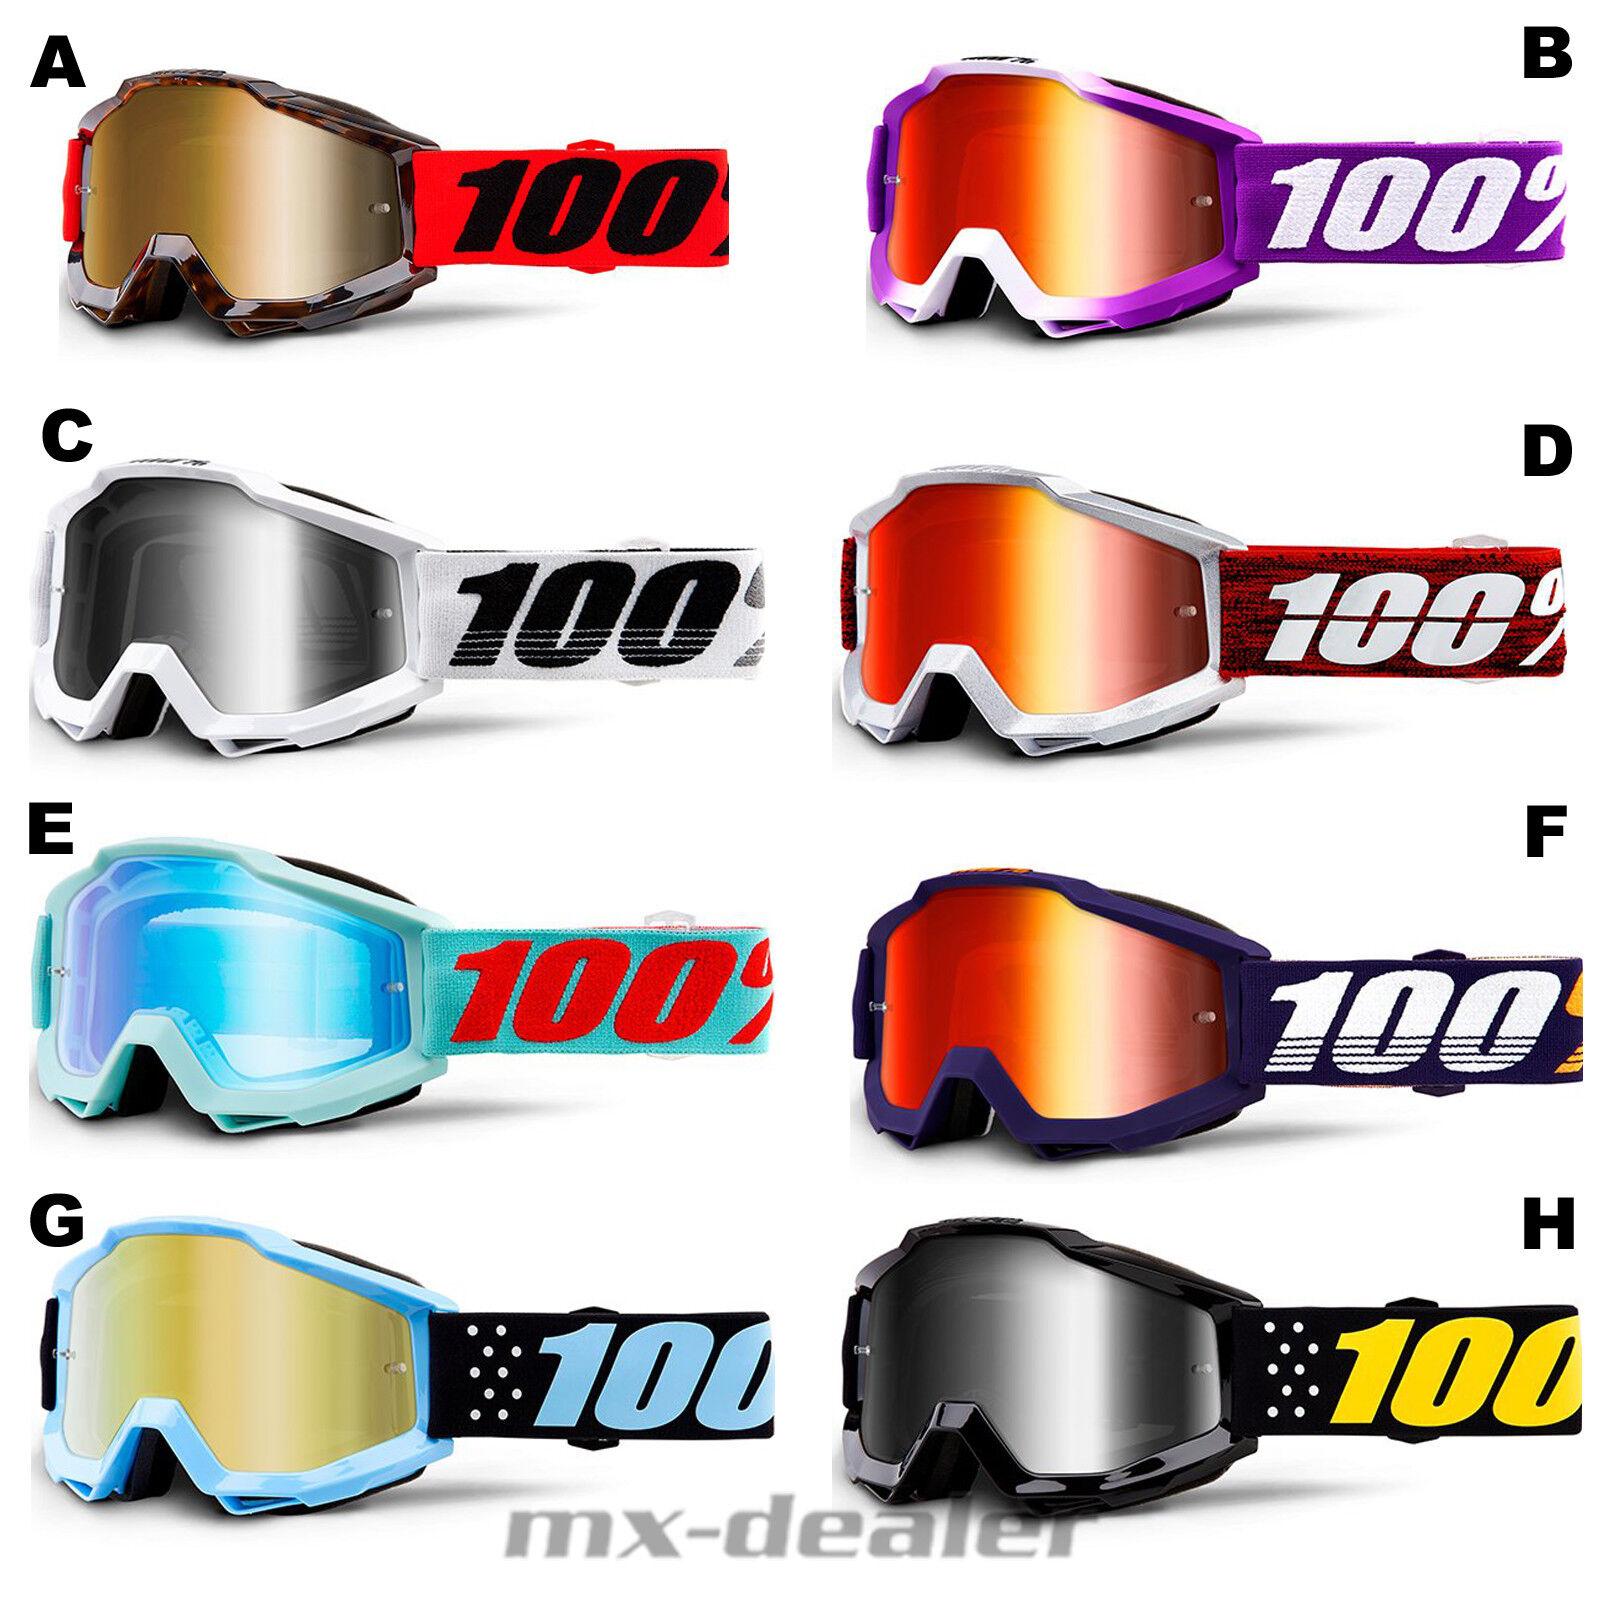 2019 100% Accuri Extra Mirroruge Goggles Motocross Enduro MTB BMX DH Cross